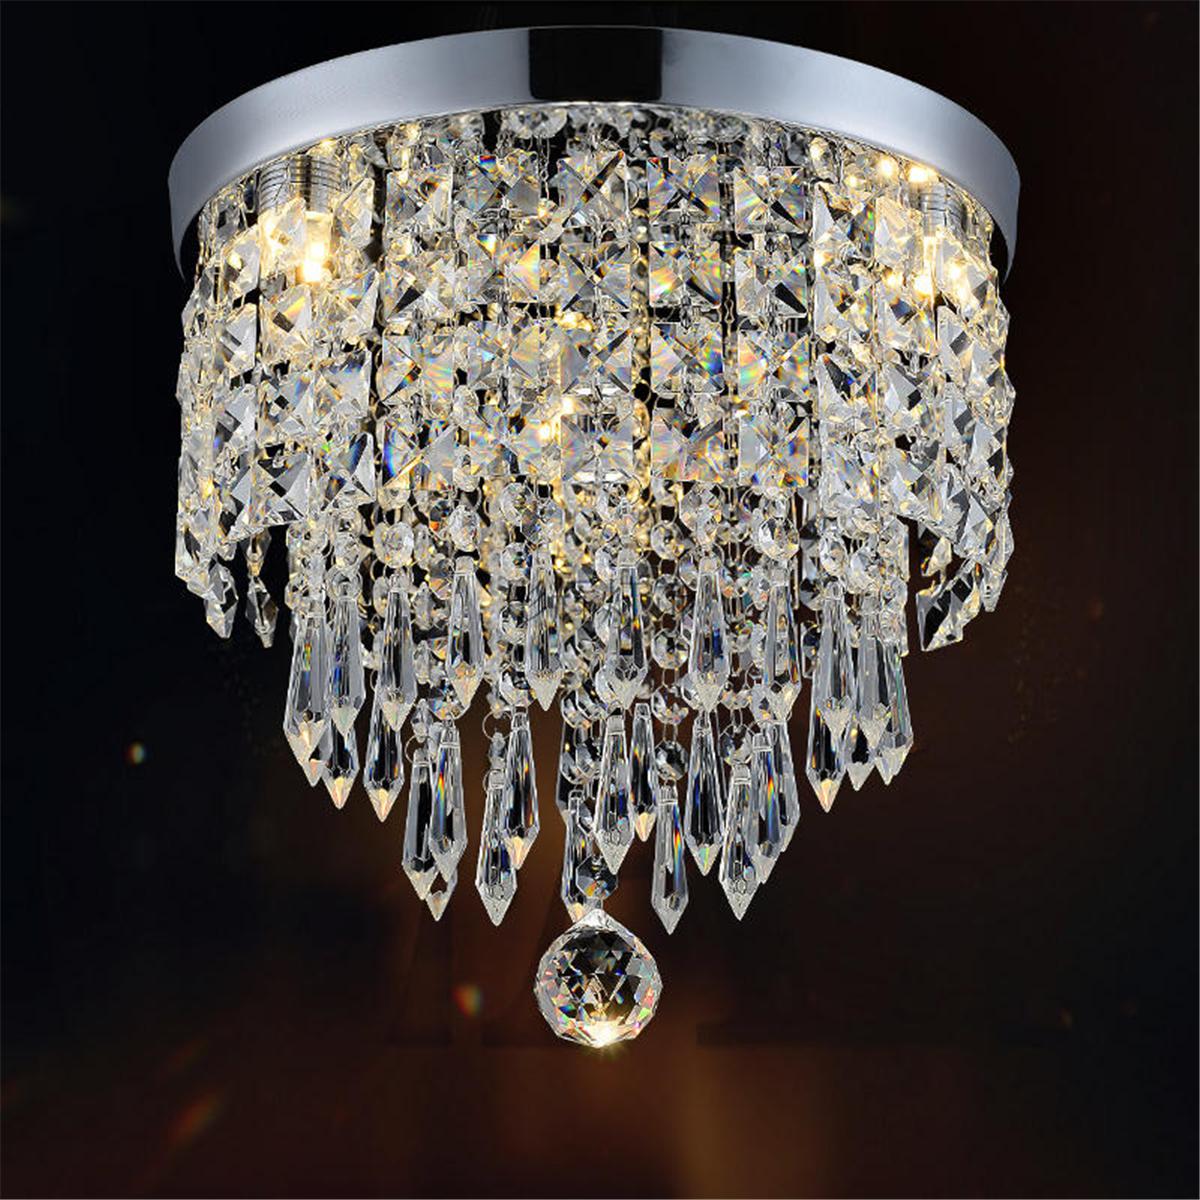 Modern LED Crystal Ceiling Light Pendant Lamp Fixture ...